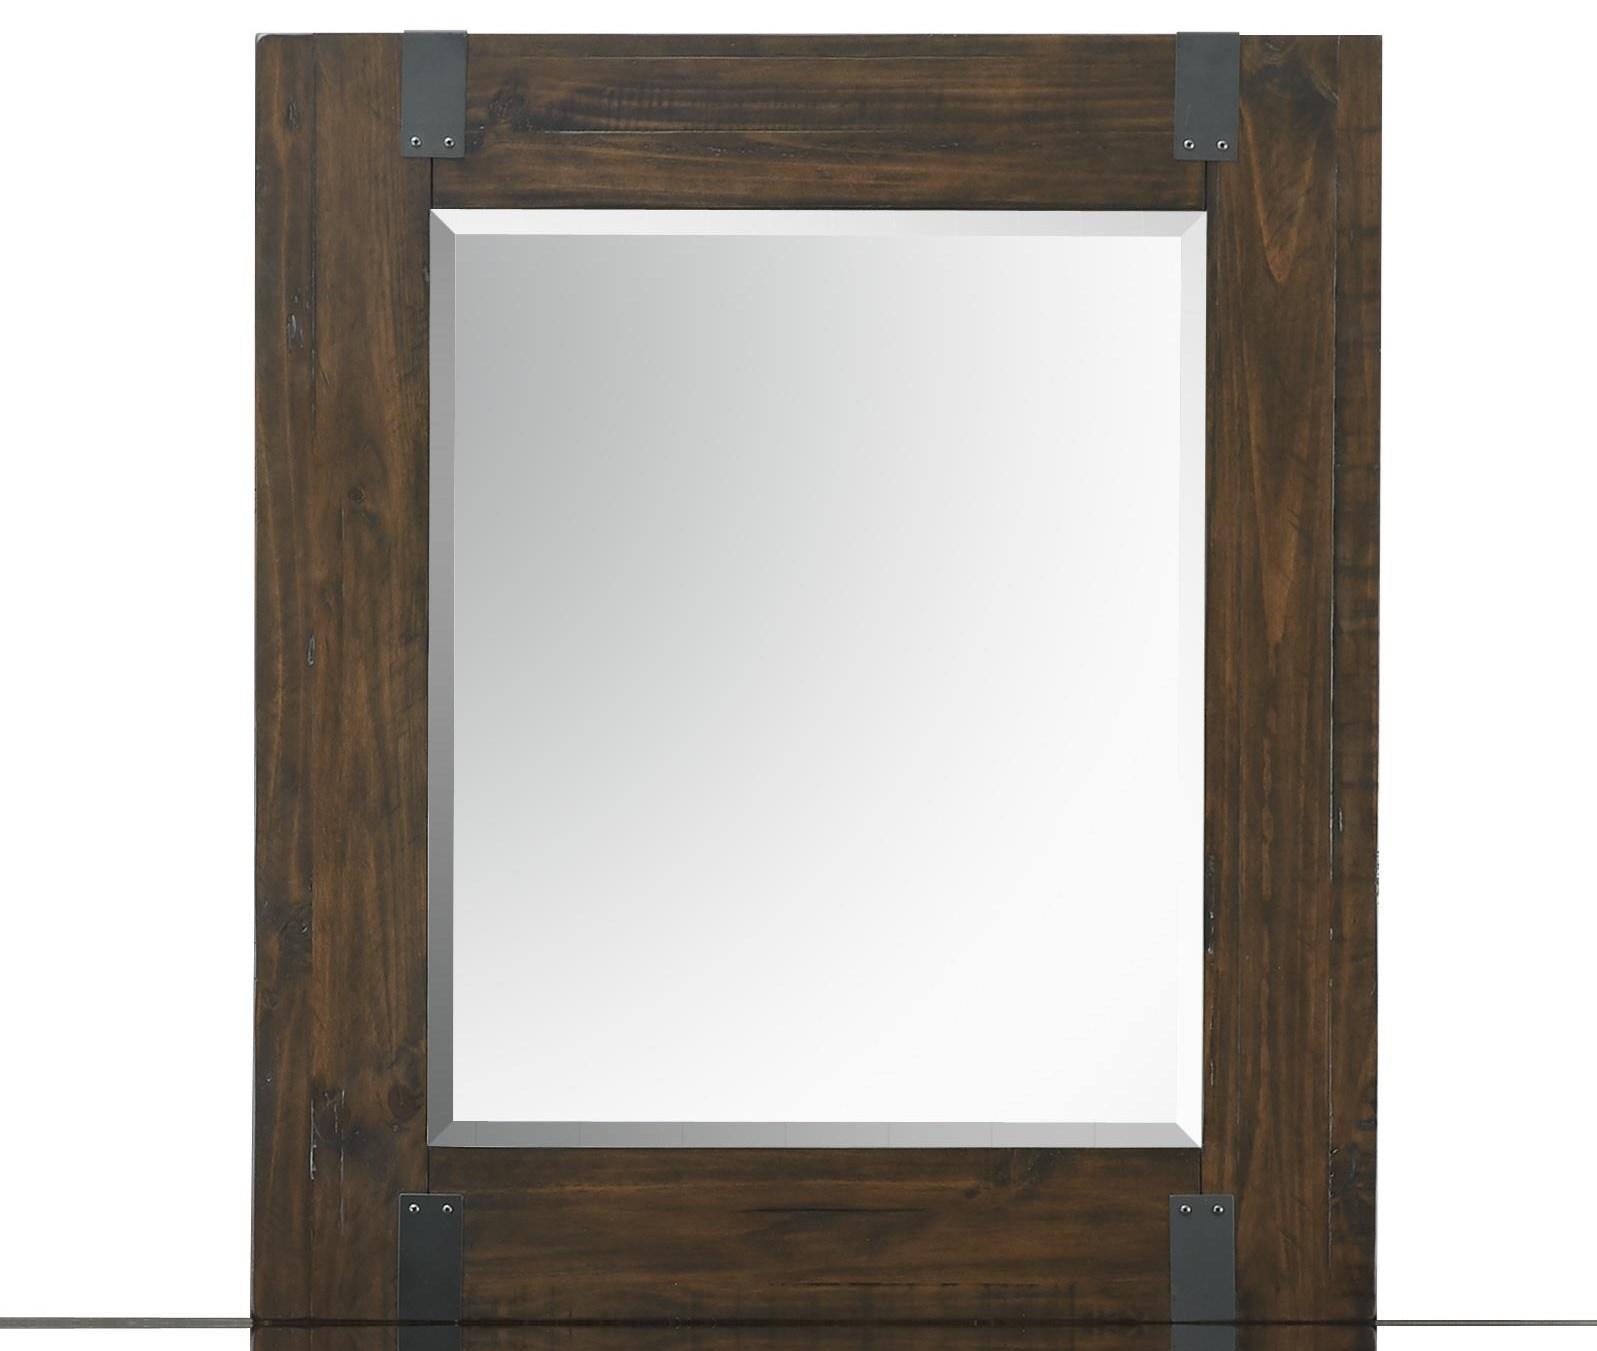 Hilltop Hilltop Mirror by Magnussen Home at Morris Home